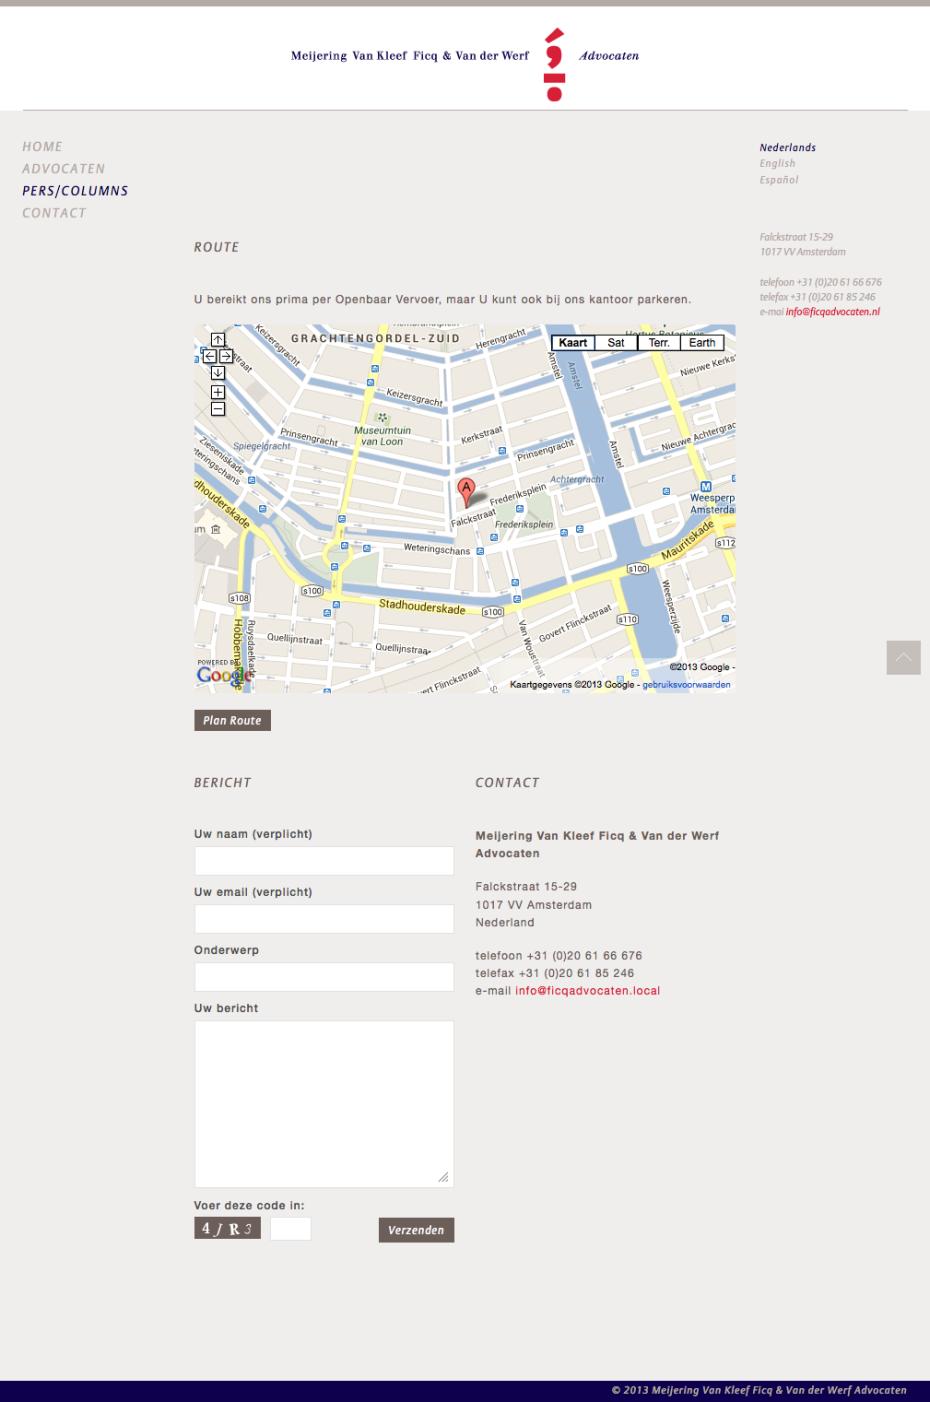 Ficq Advocaten - Contact